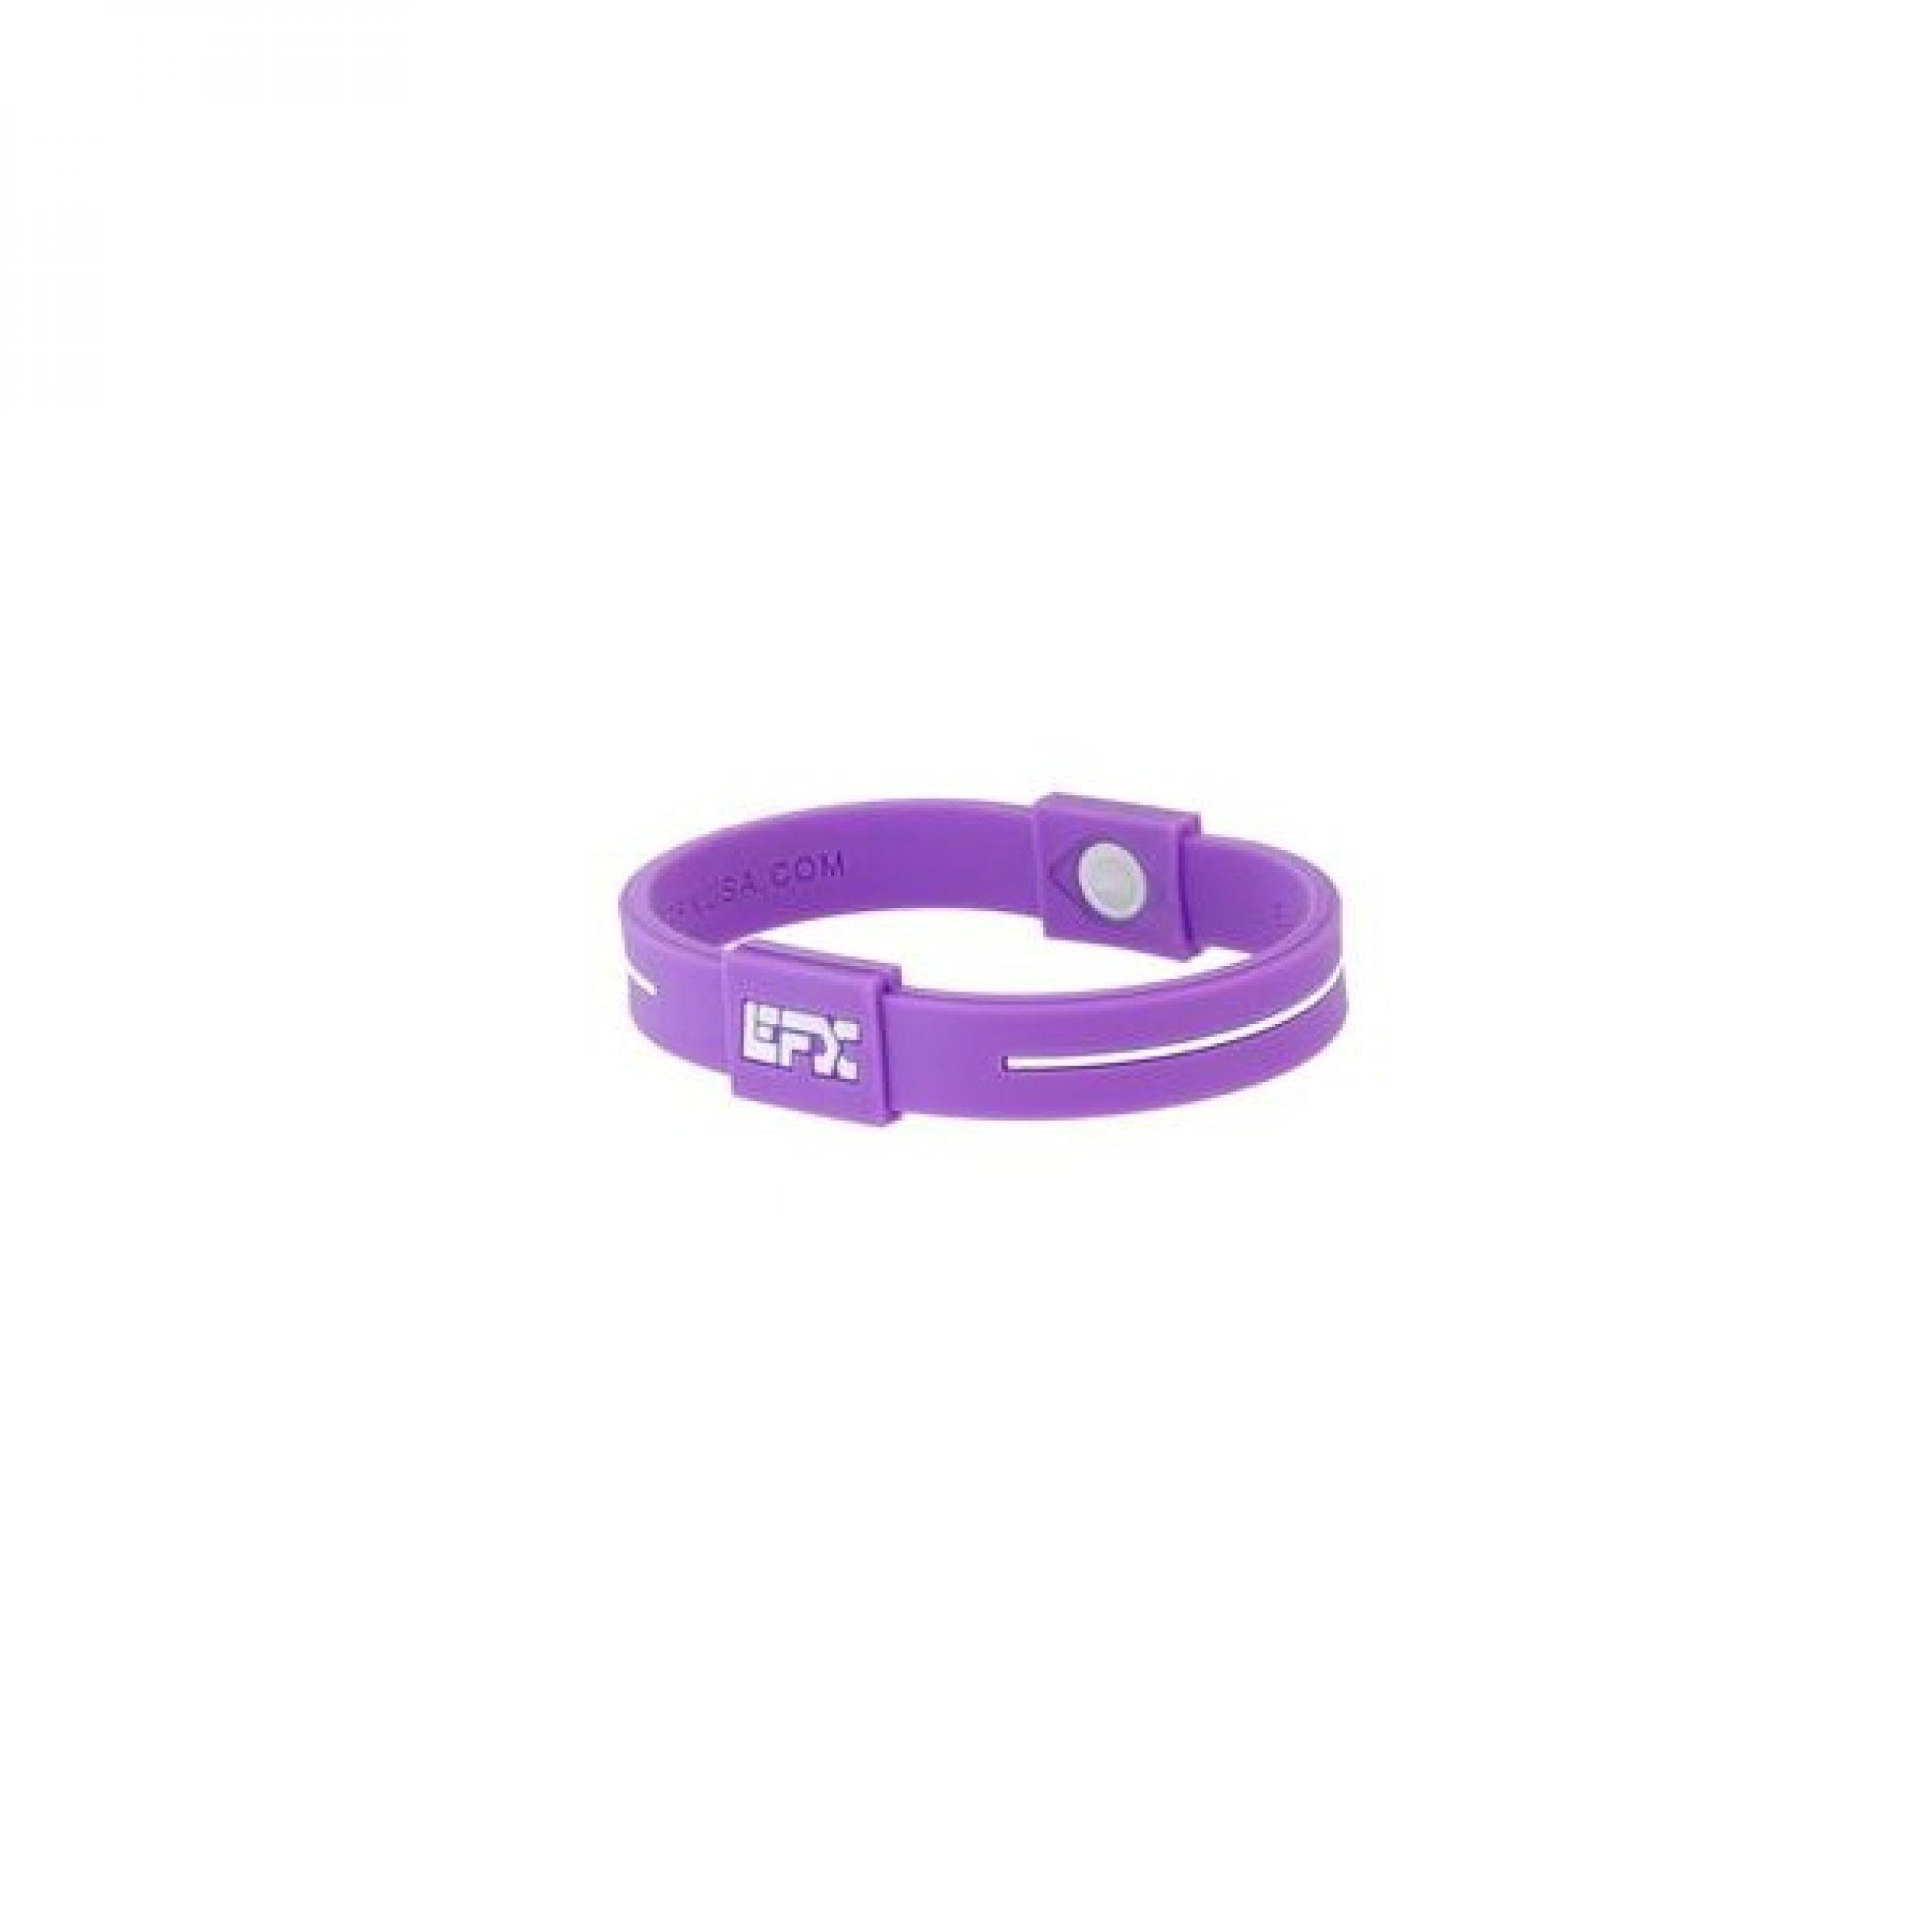 EFX_Silicone_Sports_Wrist_Band_Bracelet_M_Purple.jpg